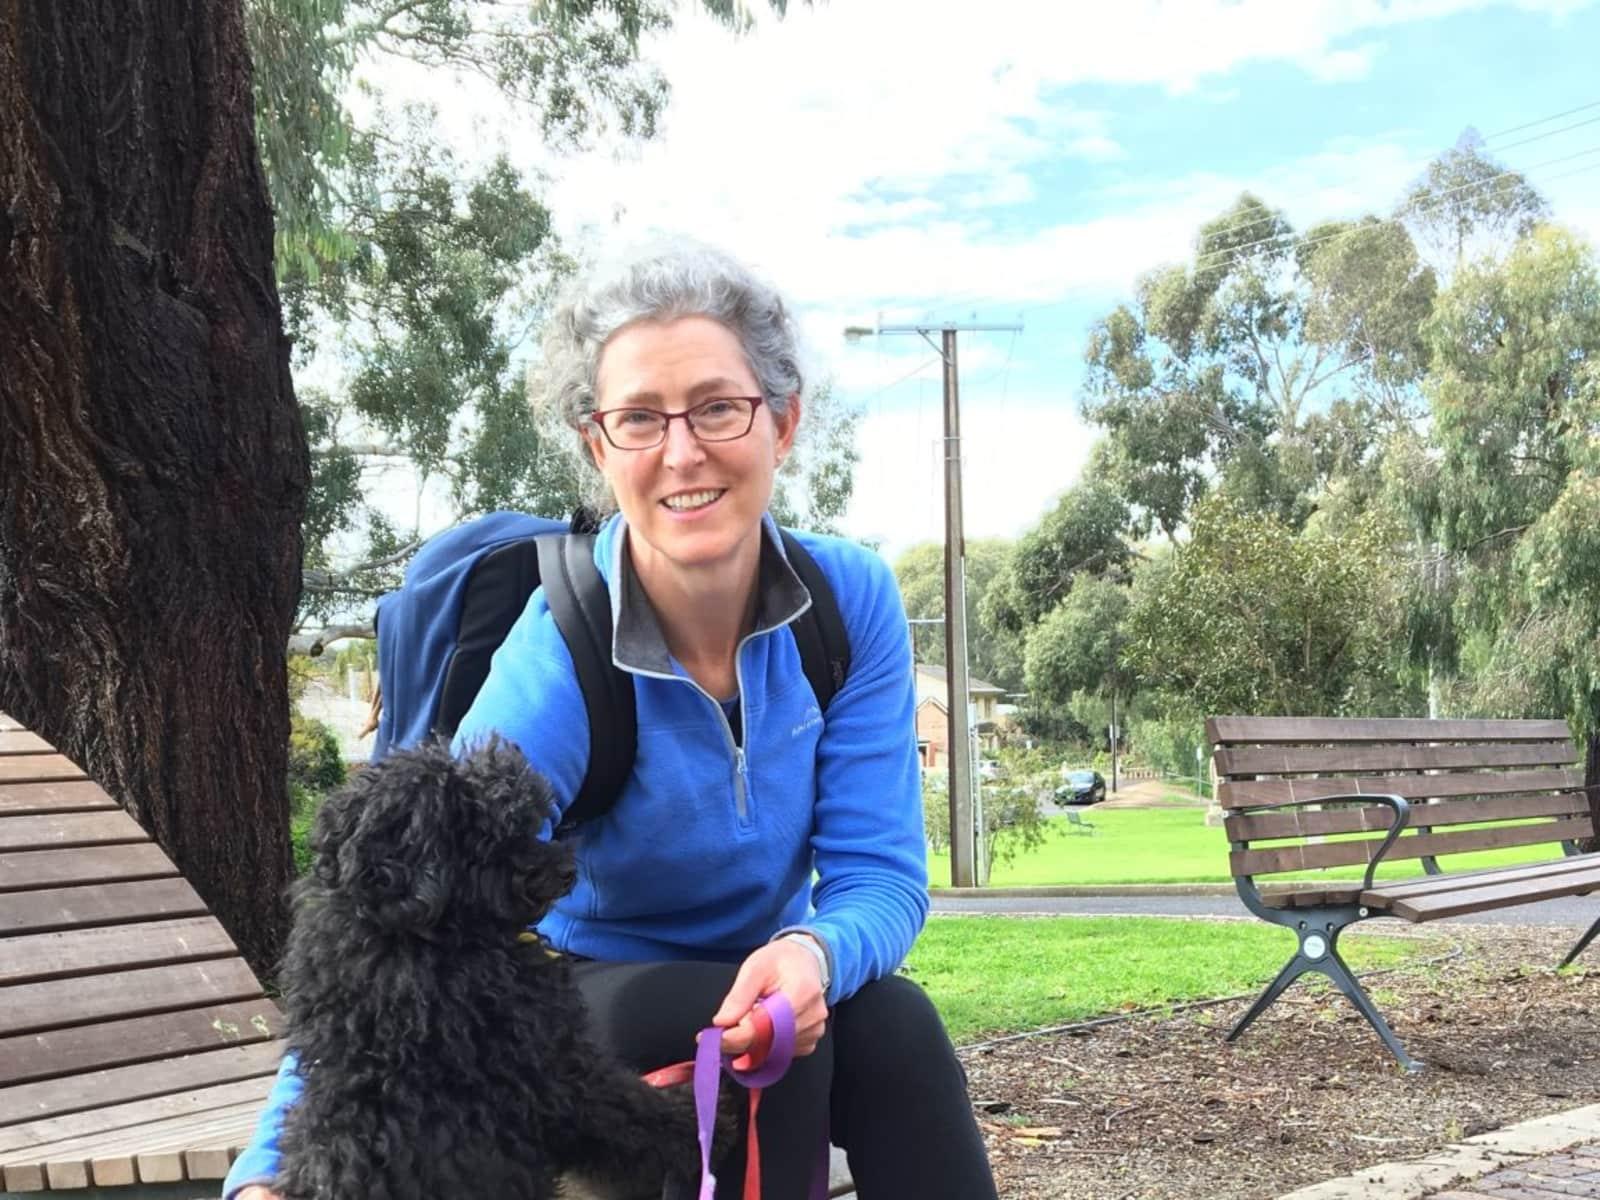 Louise & Jean-pierre from Adelaide, South Australia, Australia